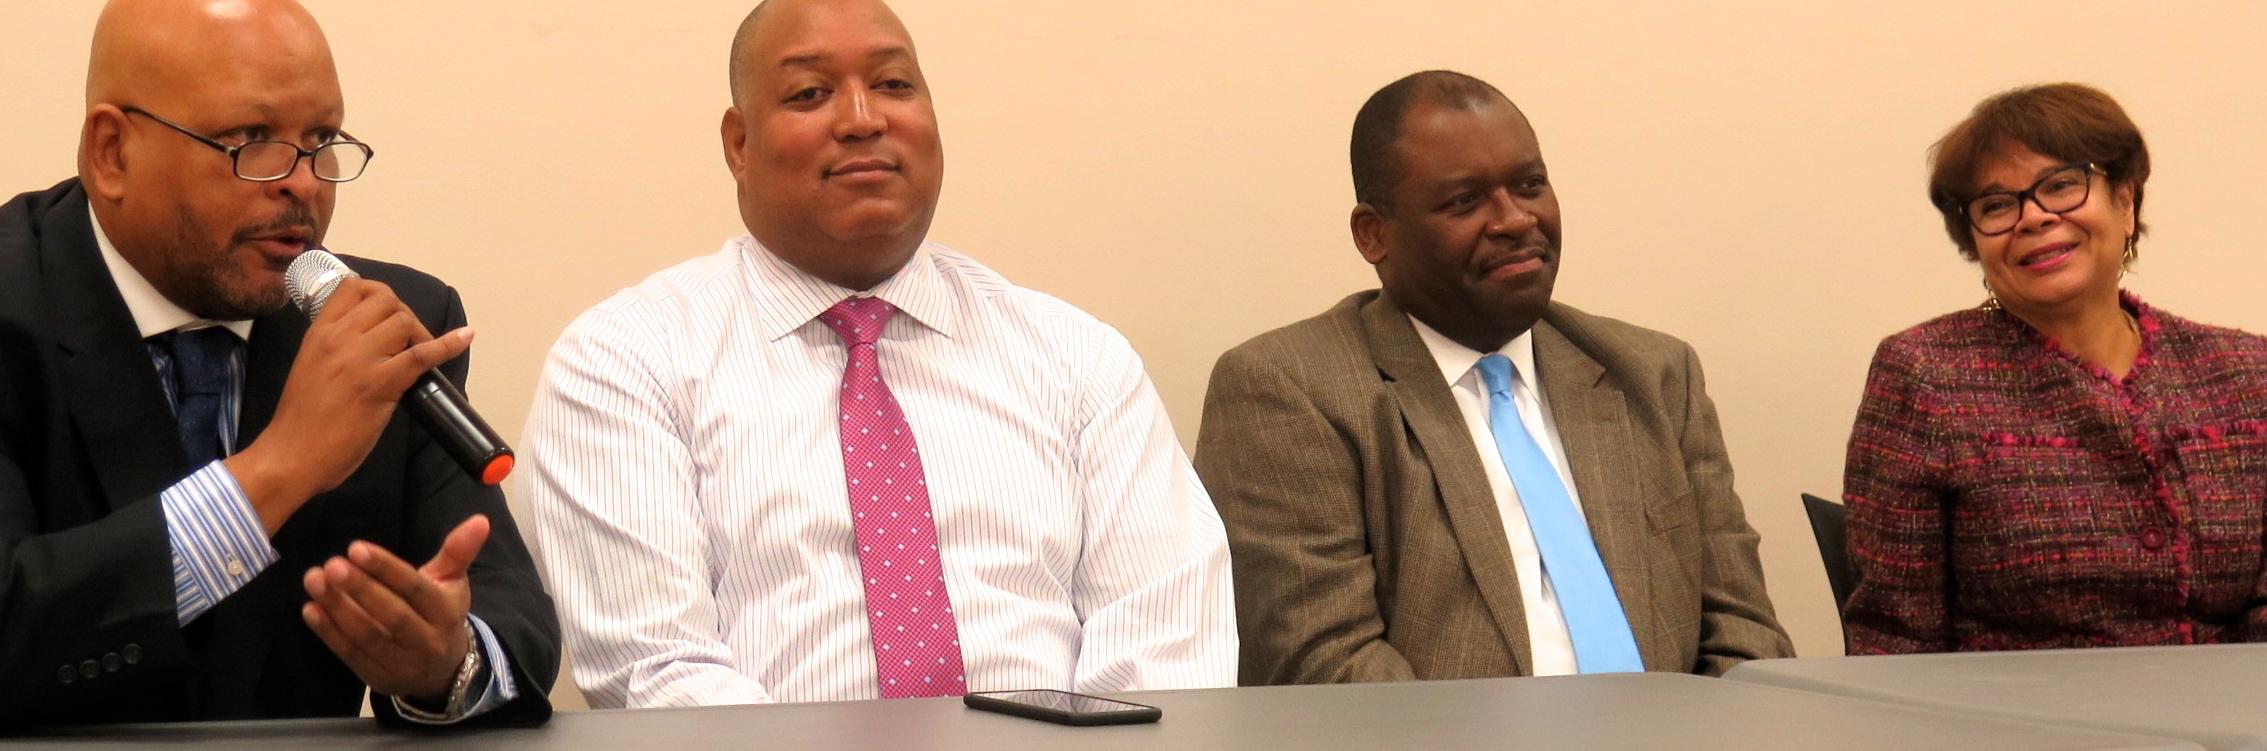 From left: N.C. Rep. Rodney Moore; N.C. Sen. Joel Ford; County Commissioner Trevor Fuller; and Charlotte Mayor Pro tem Vi Lyles.